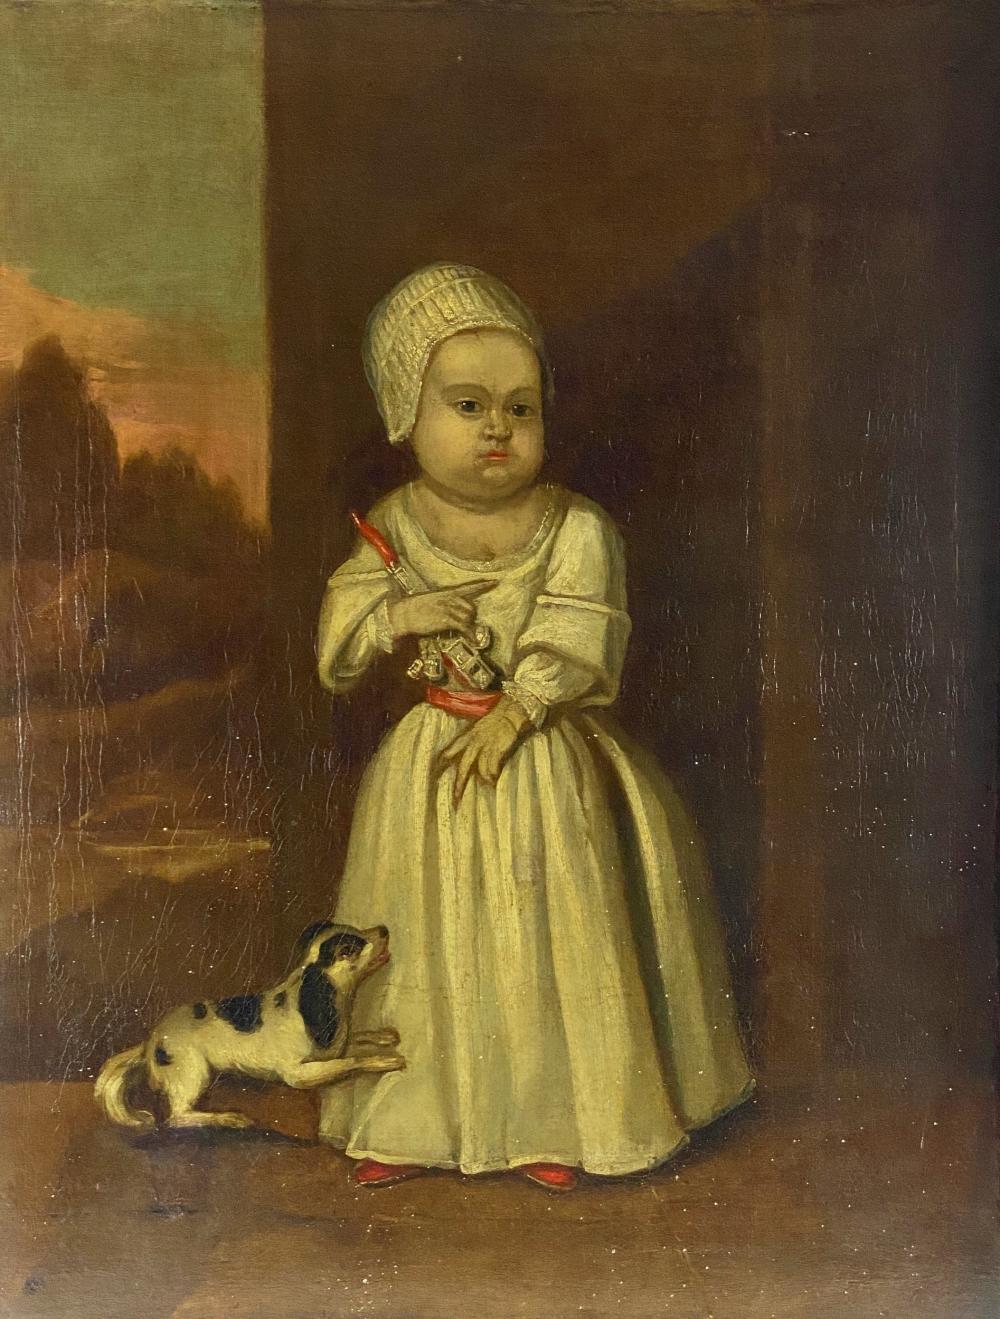 18th Century English Folk Art Portrait of Child